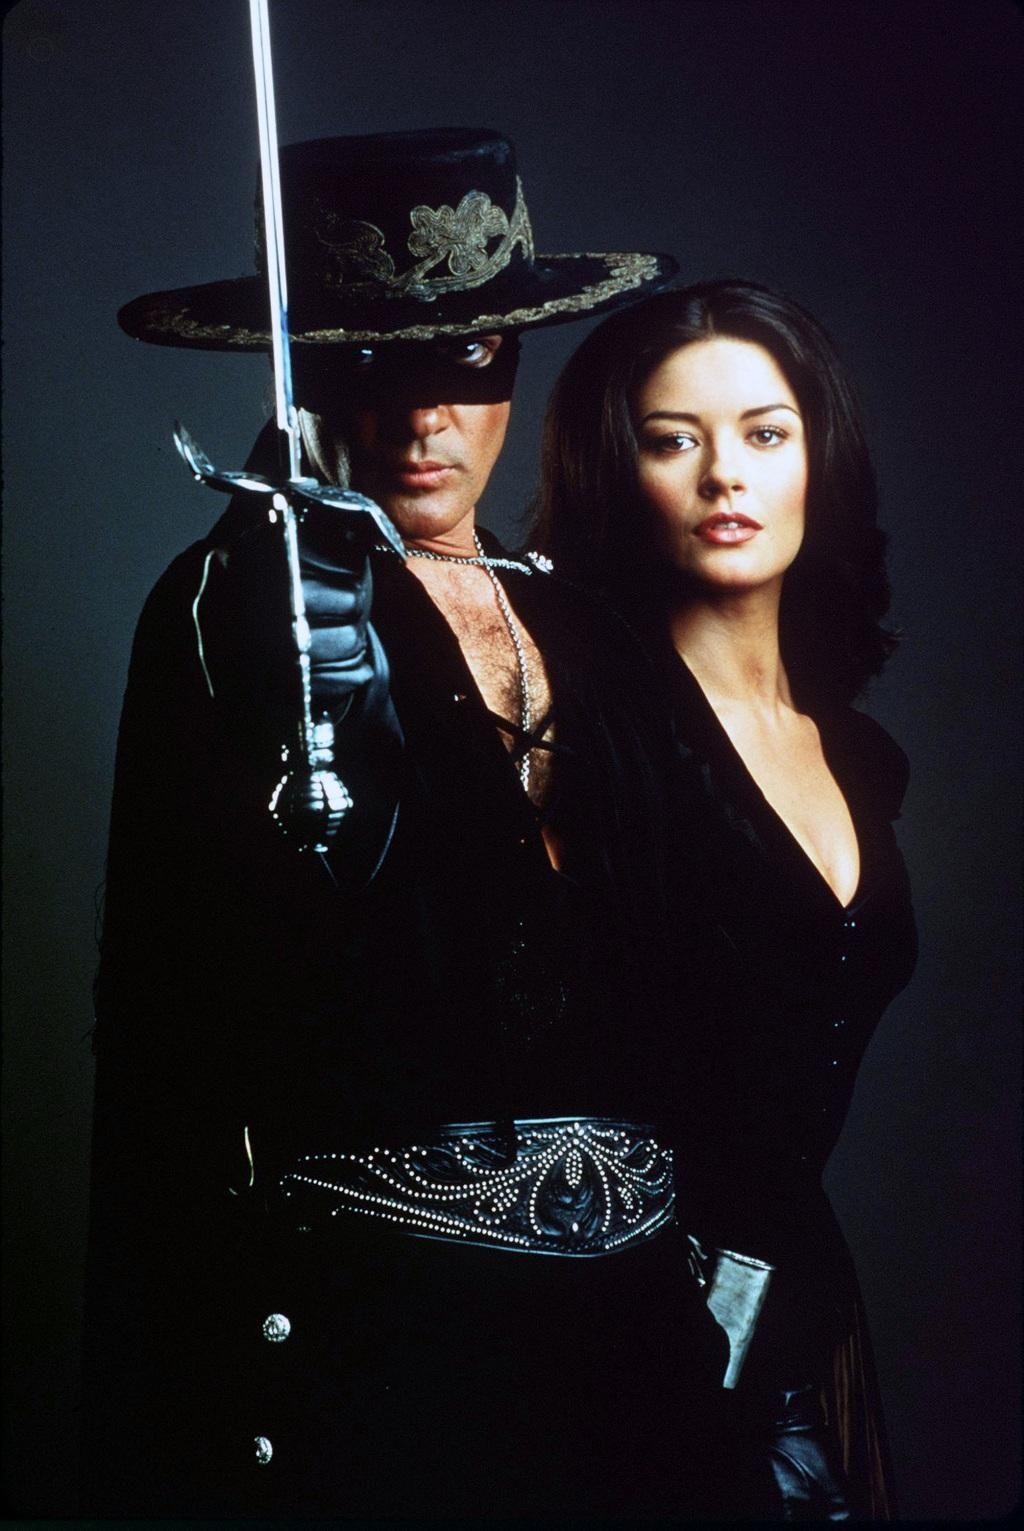 Antonio Banderas Catherine Zeta Jones The Mask Of Zorro